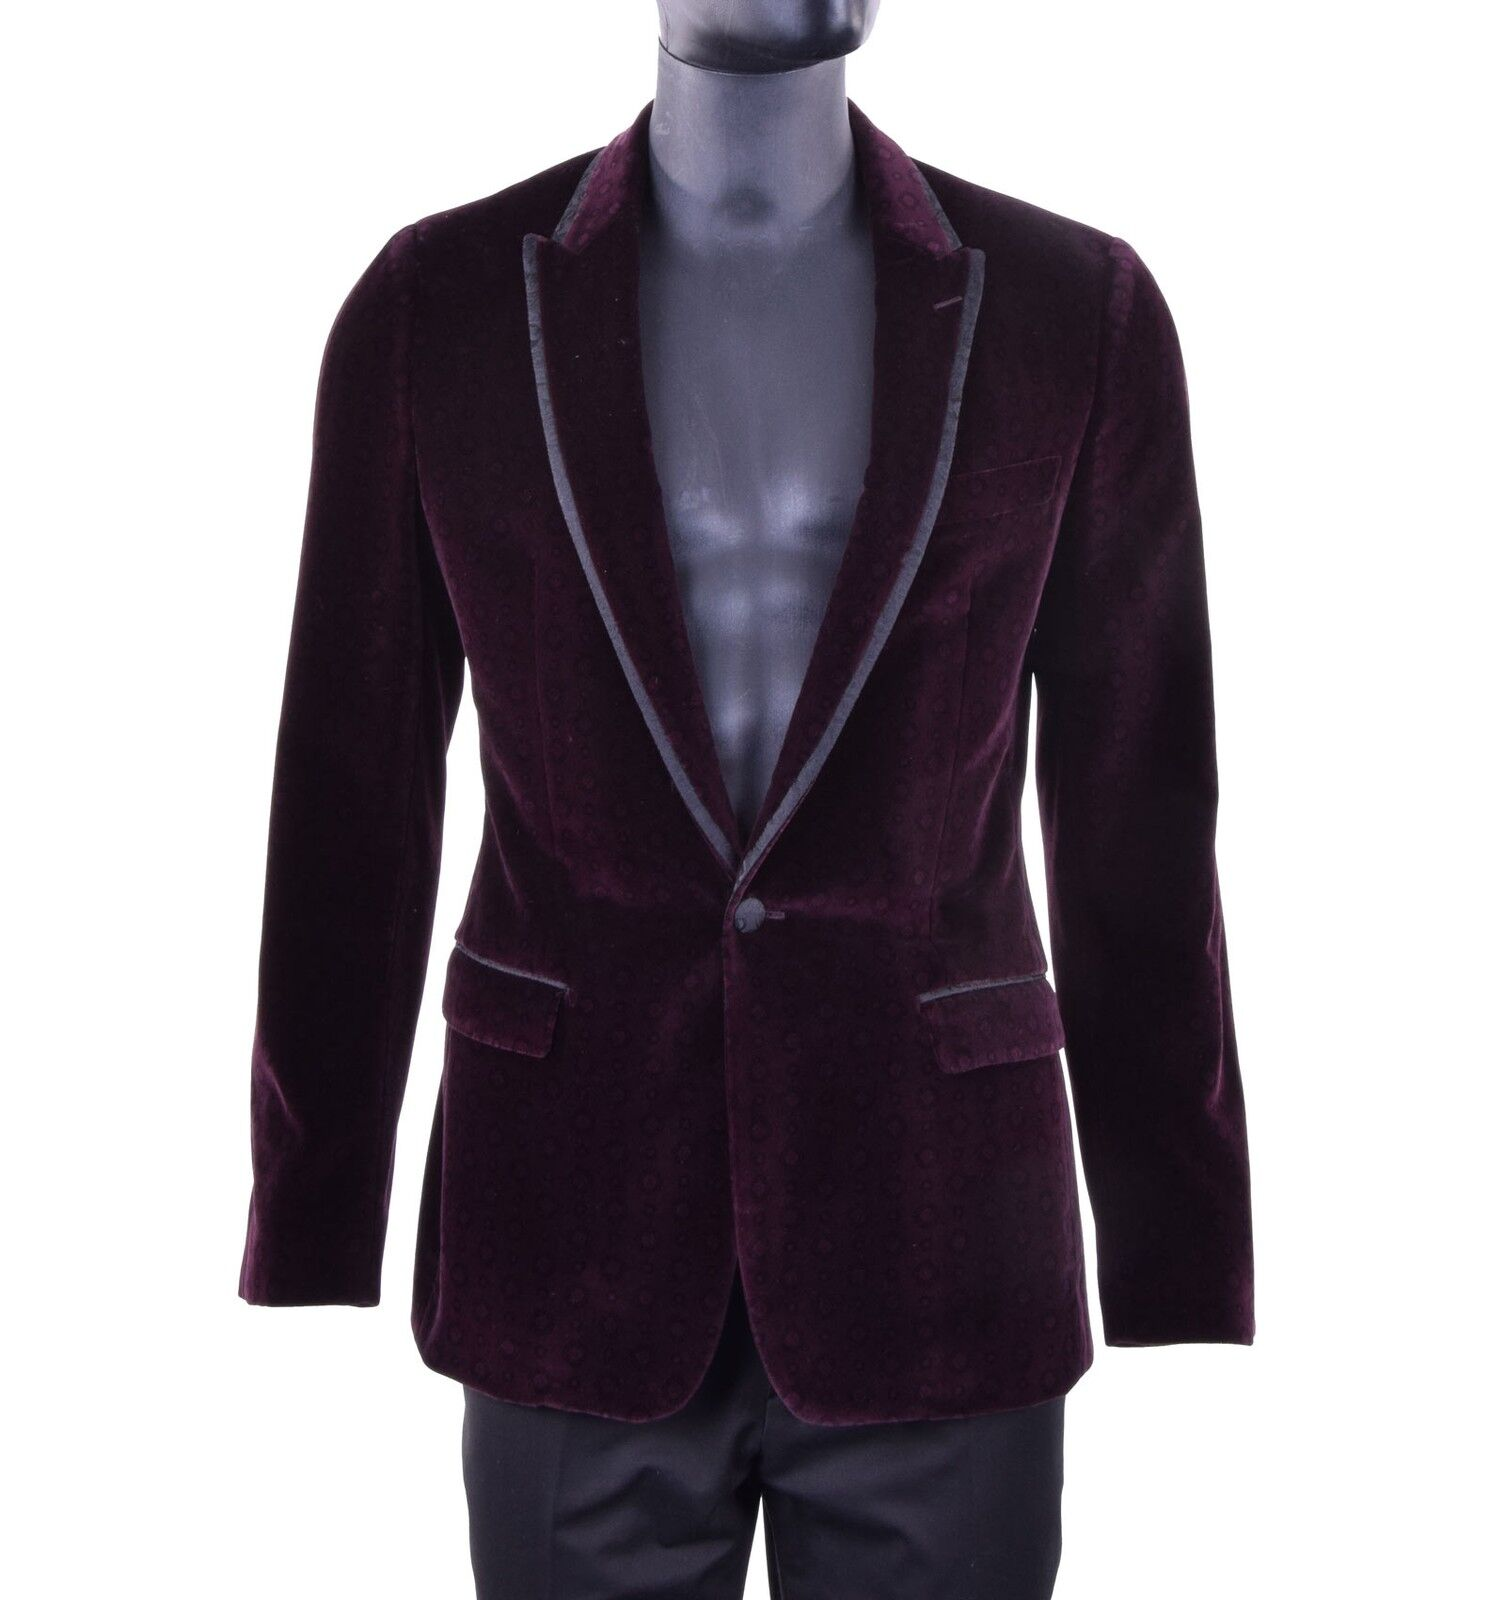 DOLCE & GABBANA RUNWAY TAORMINA Samt Blazer Sakko Bordeaux Rot Tuxedo ROT 05249